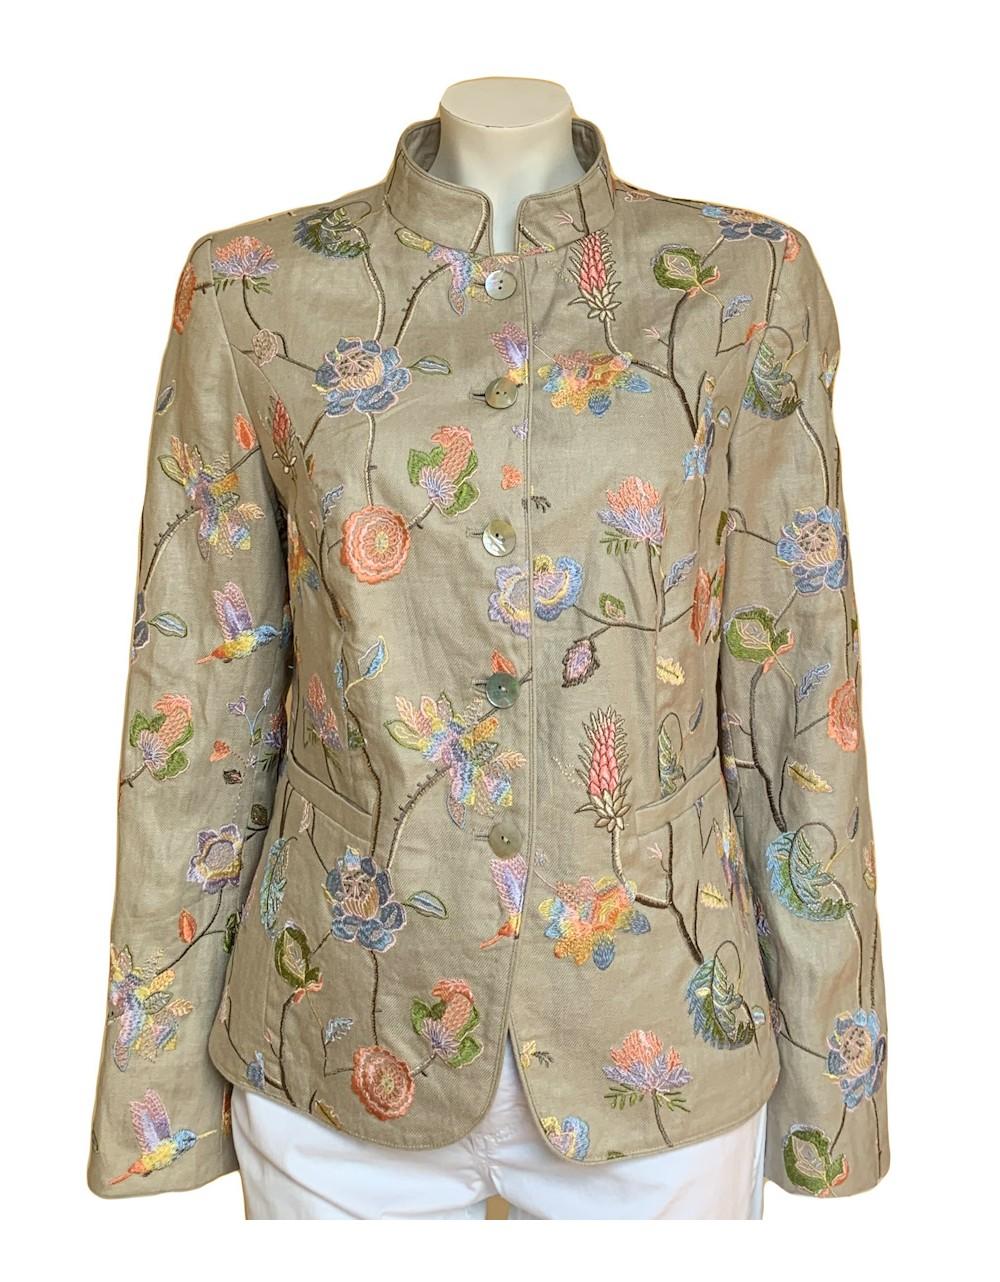 White Label Linen Jacket|826212|Rofa Fashions|Irish Handcrafts 1